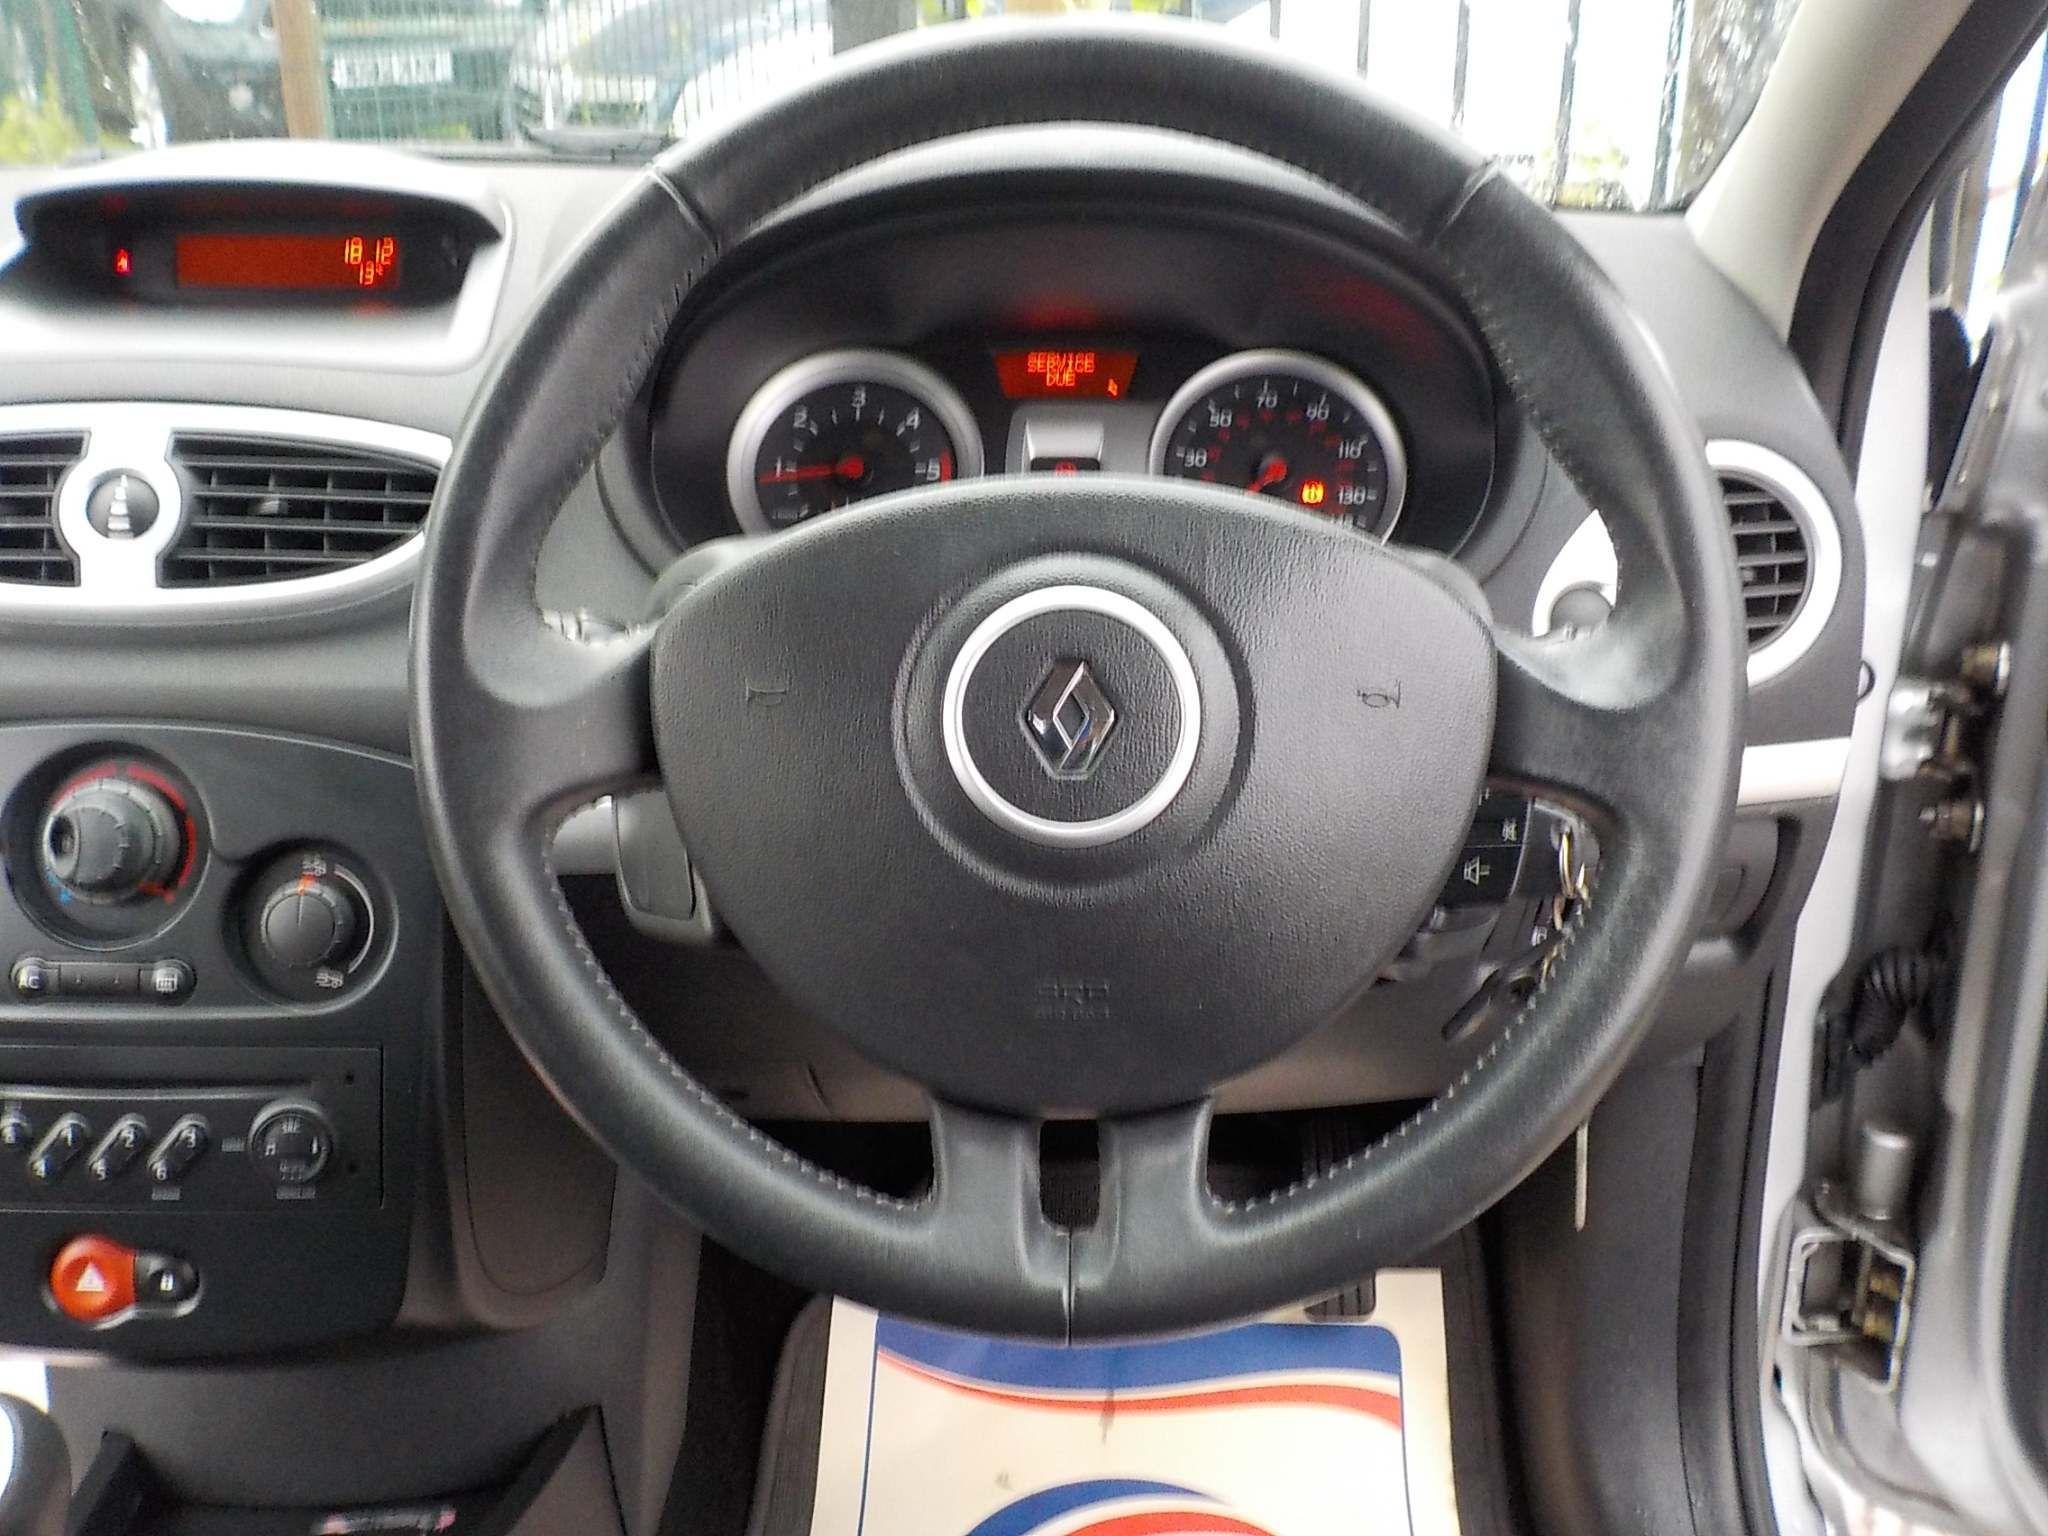 Renault Clio 1.4 16v Dynamique 5dr